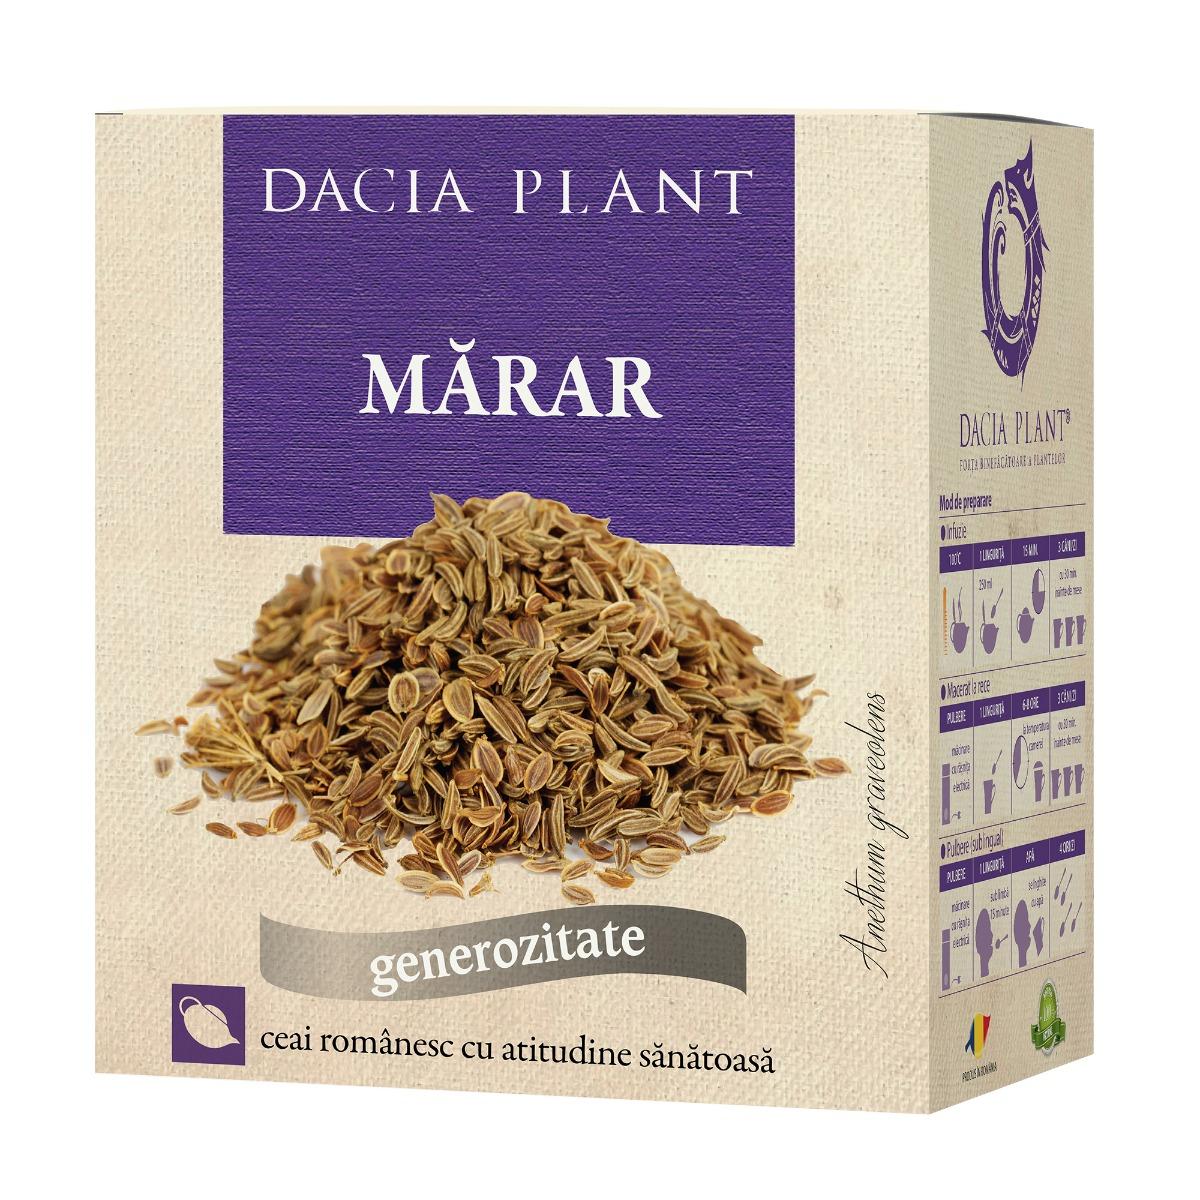 Ceai de marar, 100g, Dacia Plant drmax.ro